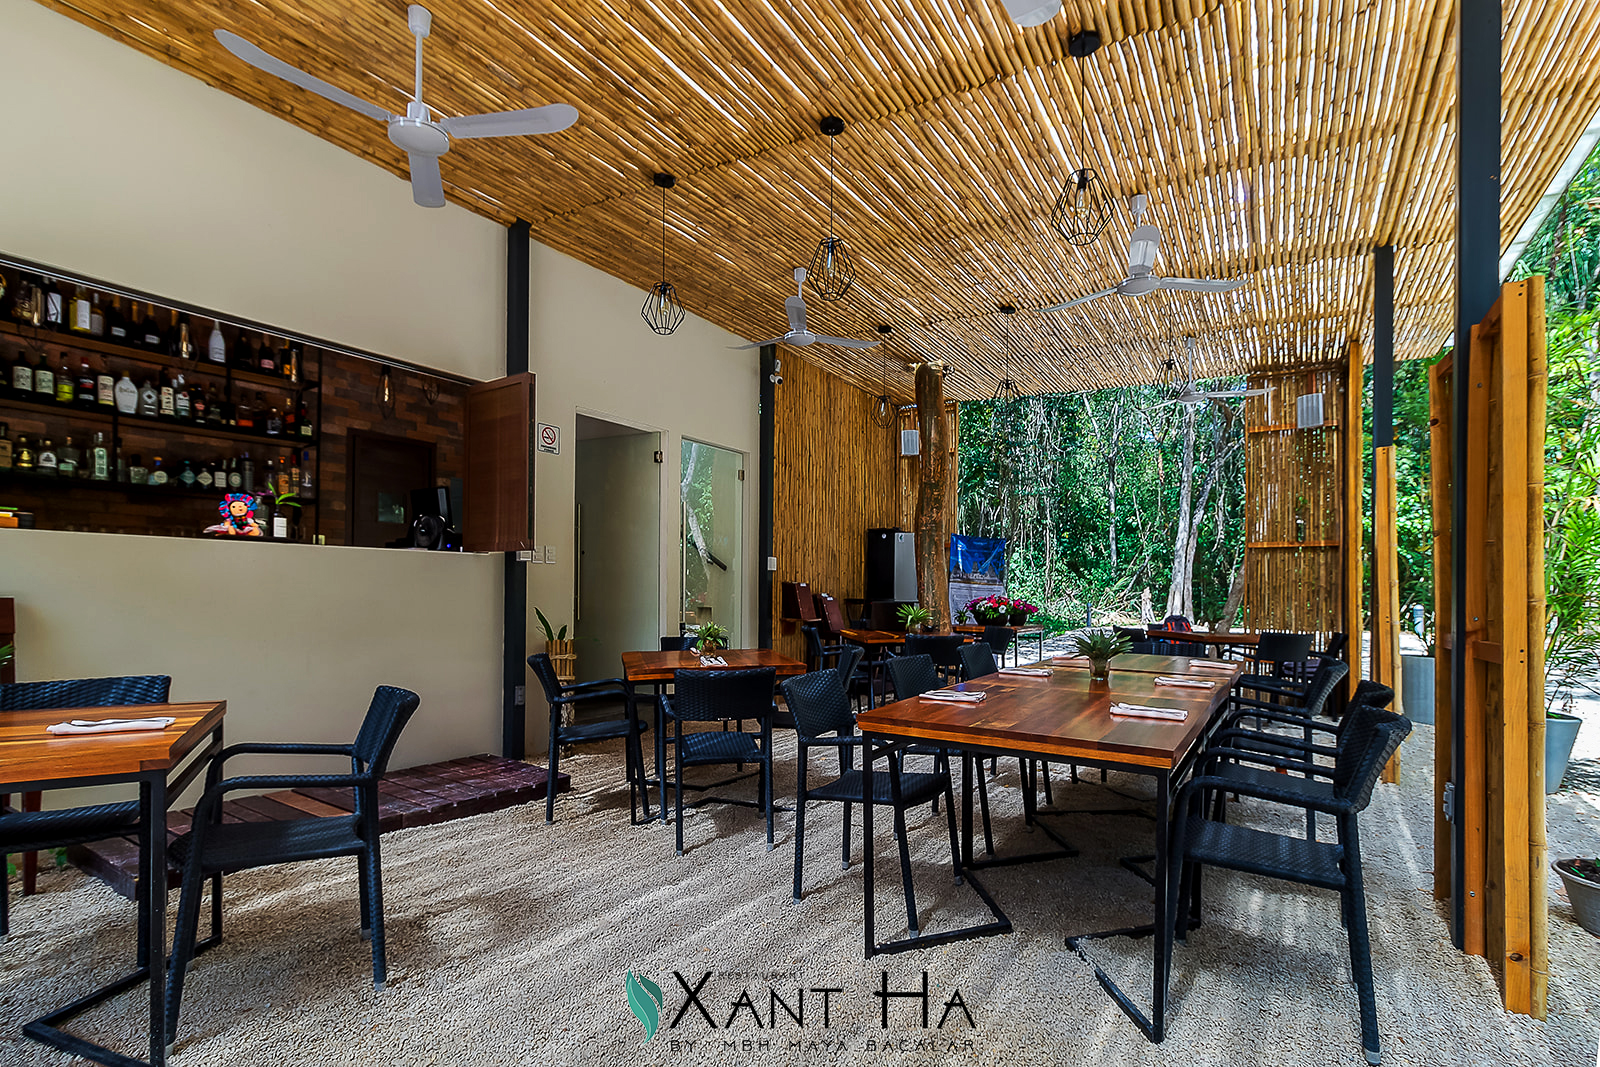 Xant-ha-10_Logo